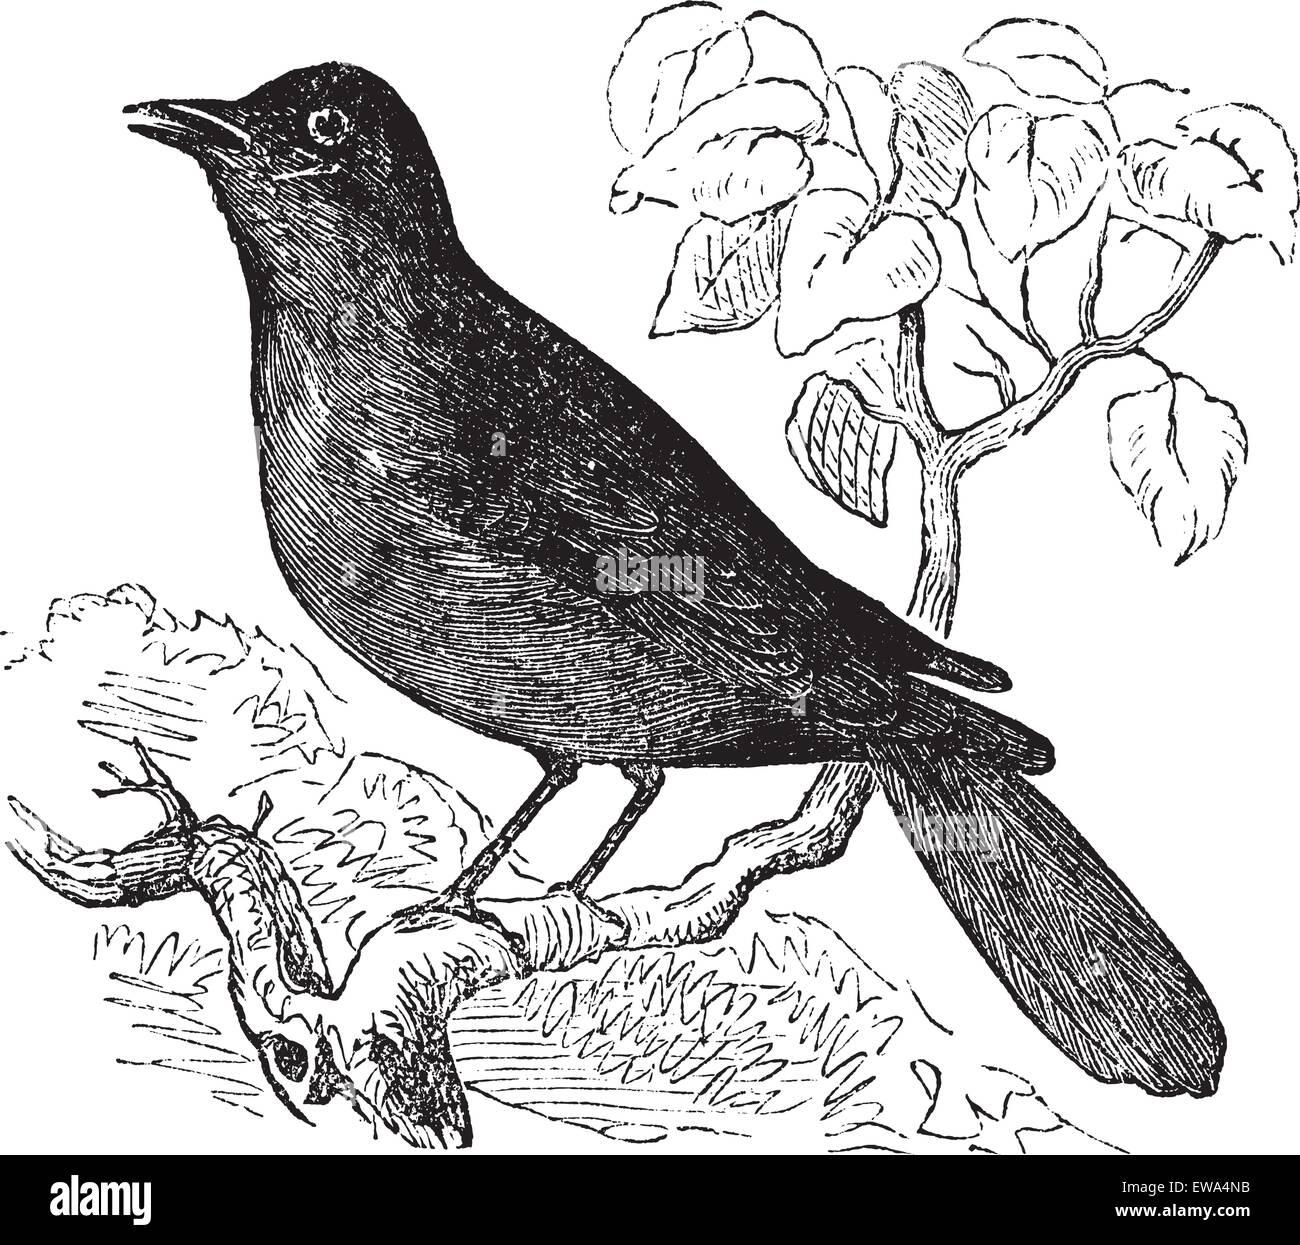 Great Reed Warbler or Acrocephalus arundinaceus, vintage engraving. Old engraved illustration of Great Reed Warbler - Stock Vector